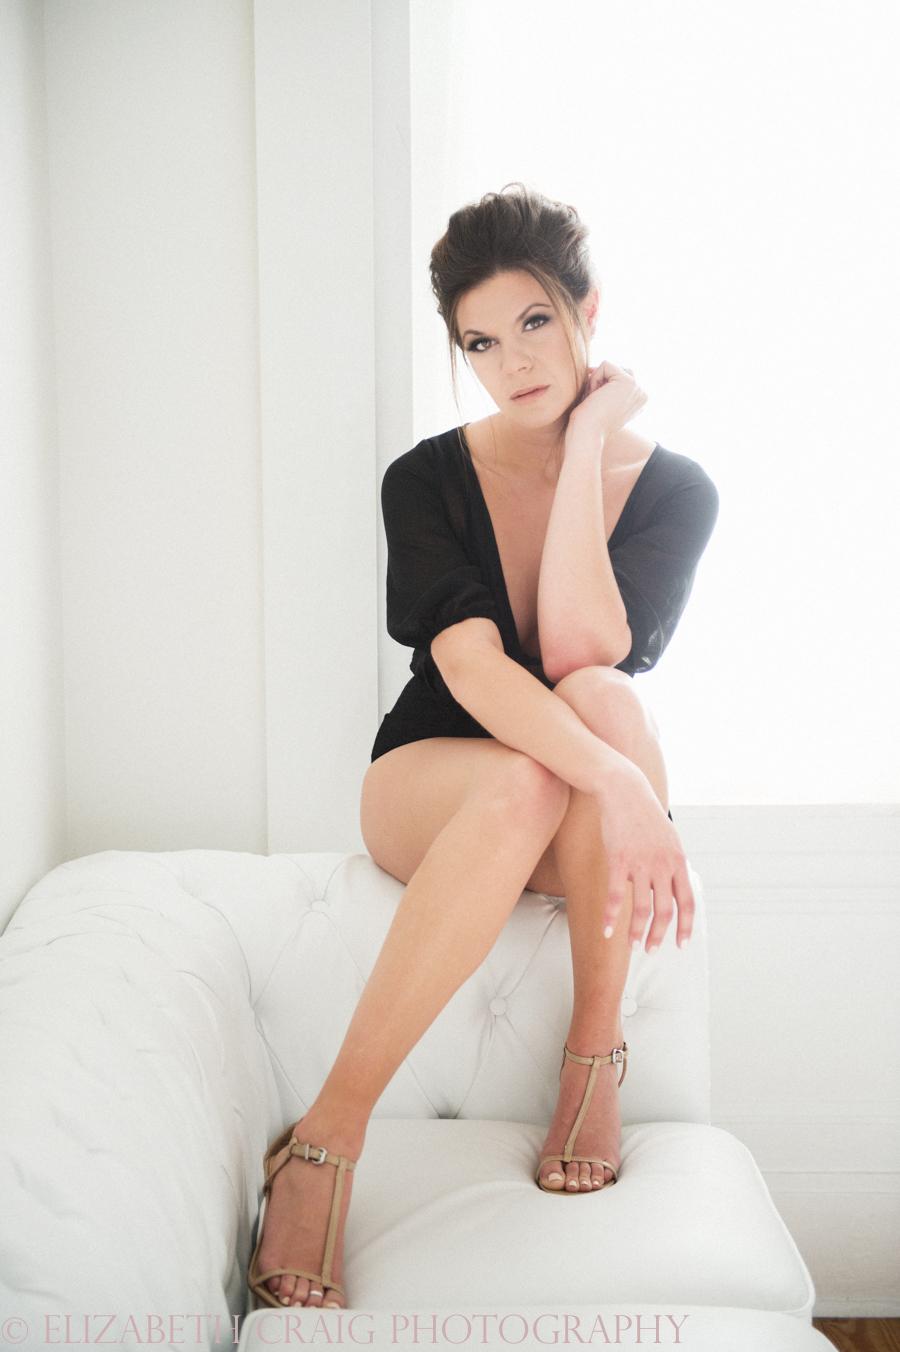 elizabeth-craig-boudoir-photography-8